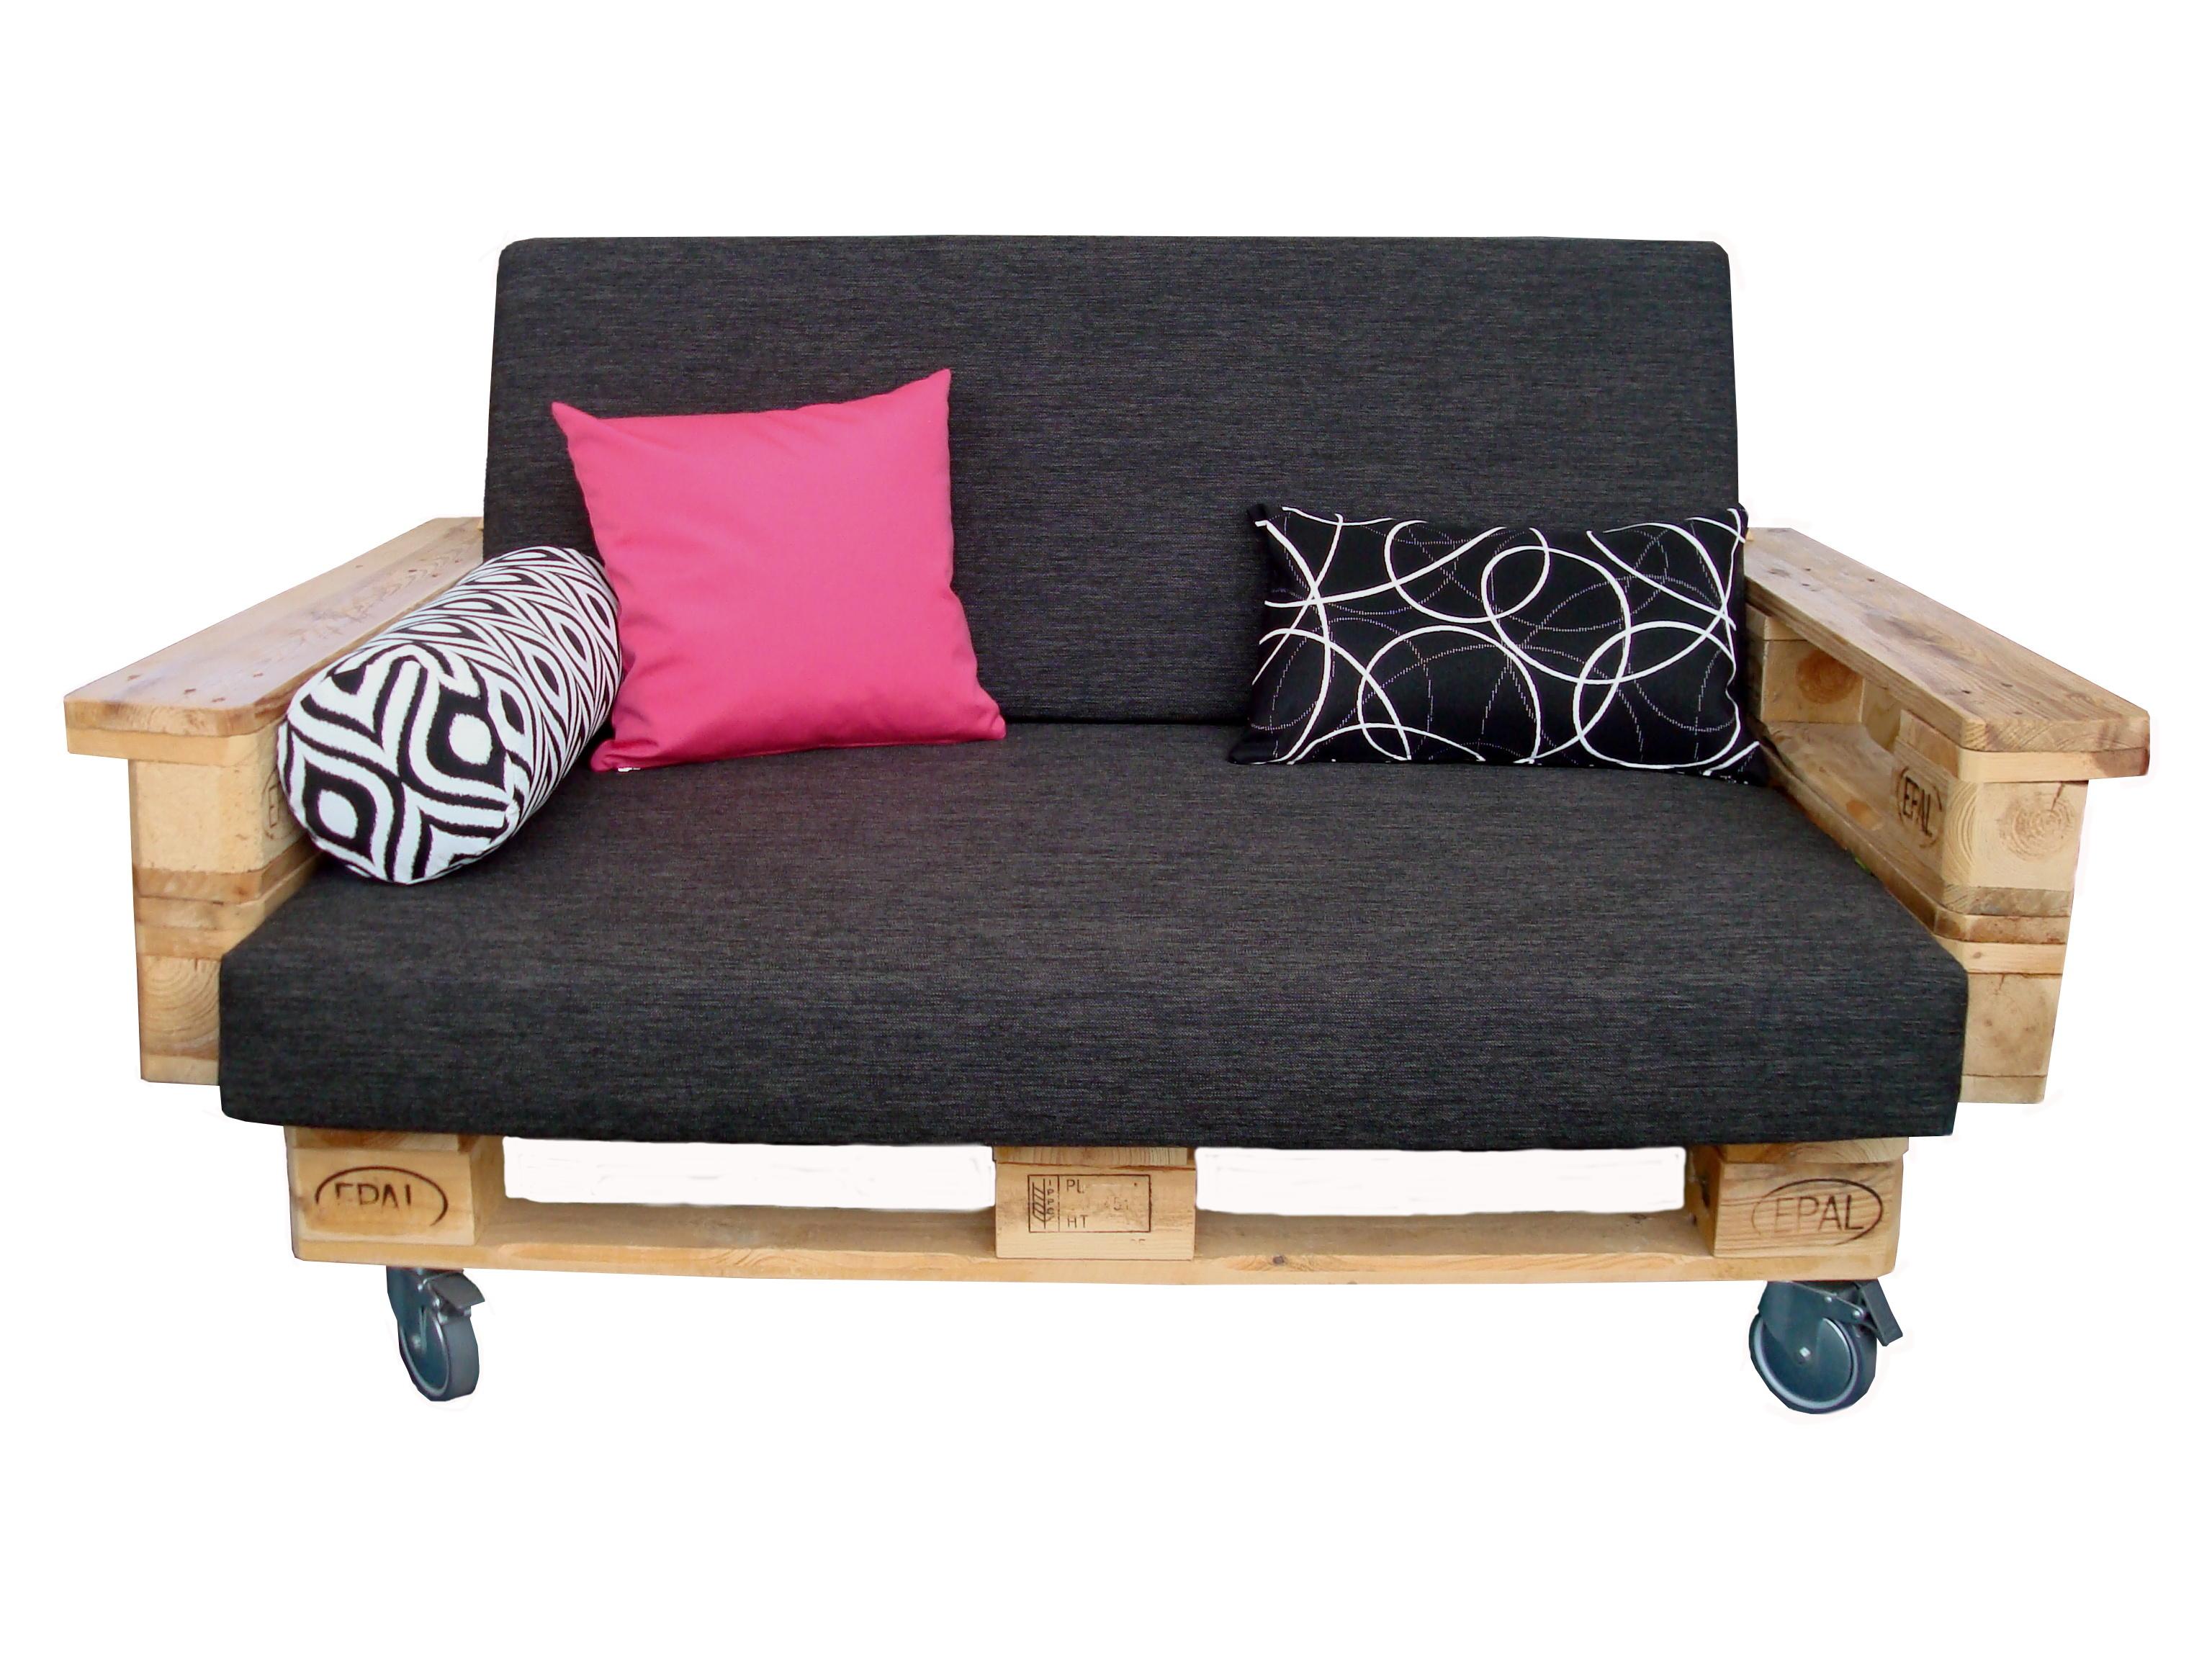 awesome bankauflage nach ma ideas. Black Bedroom Furniture Sets. Home Design Ideas